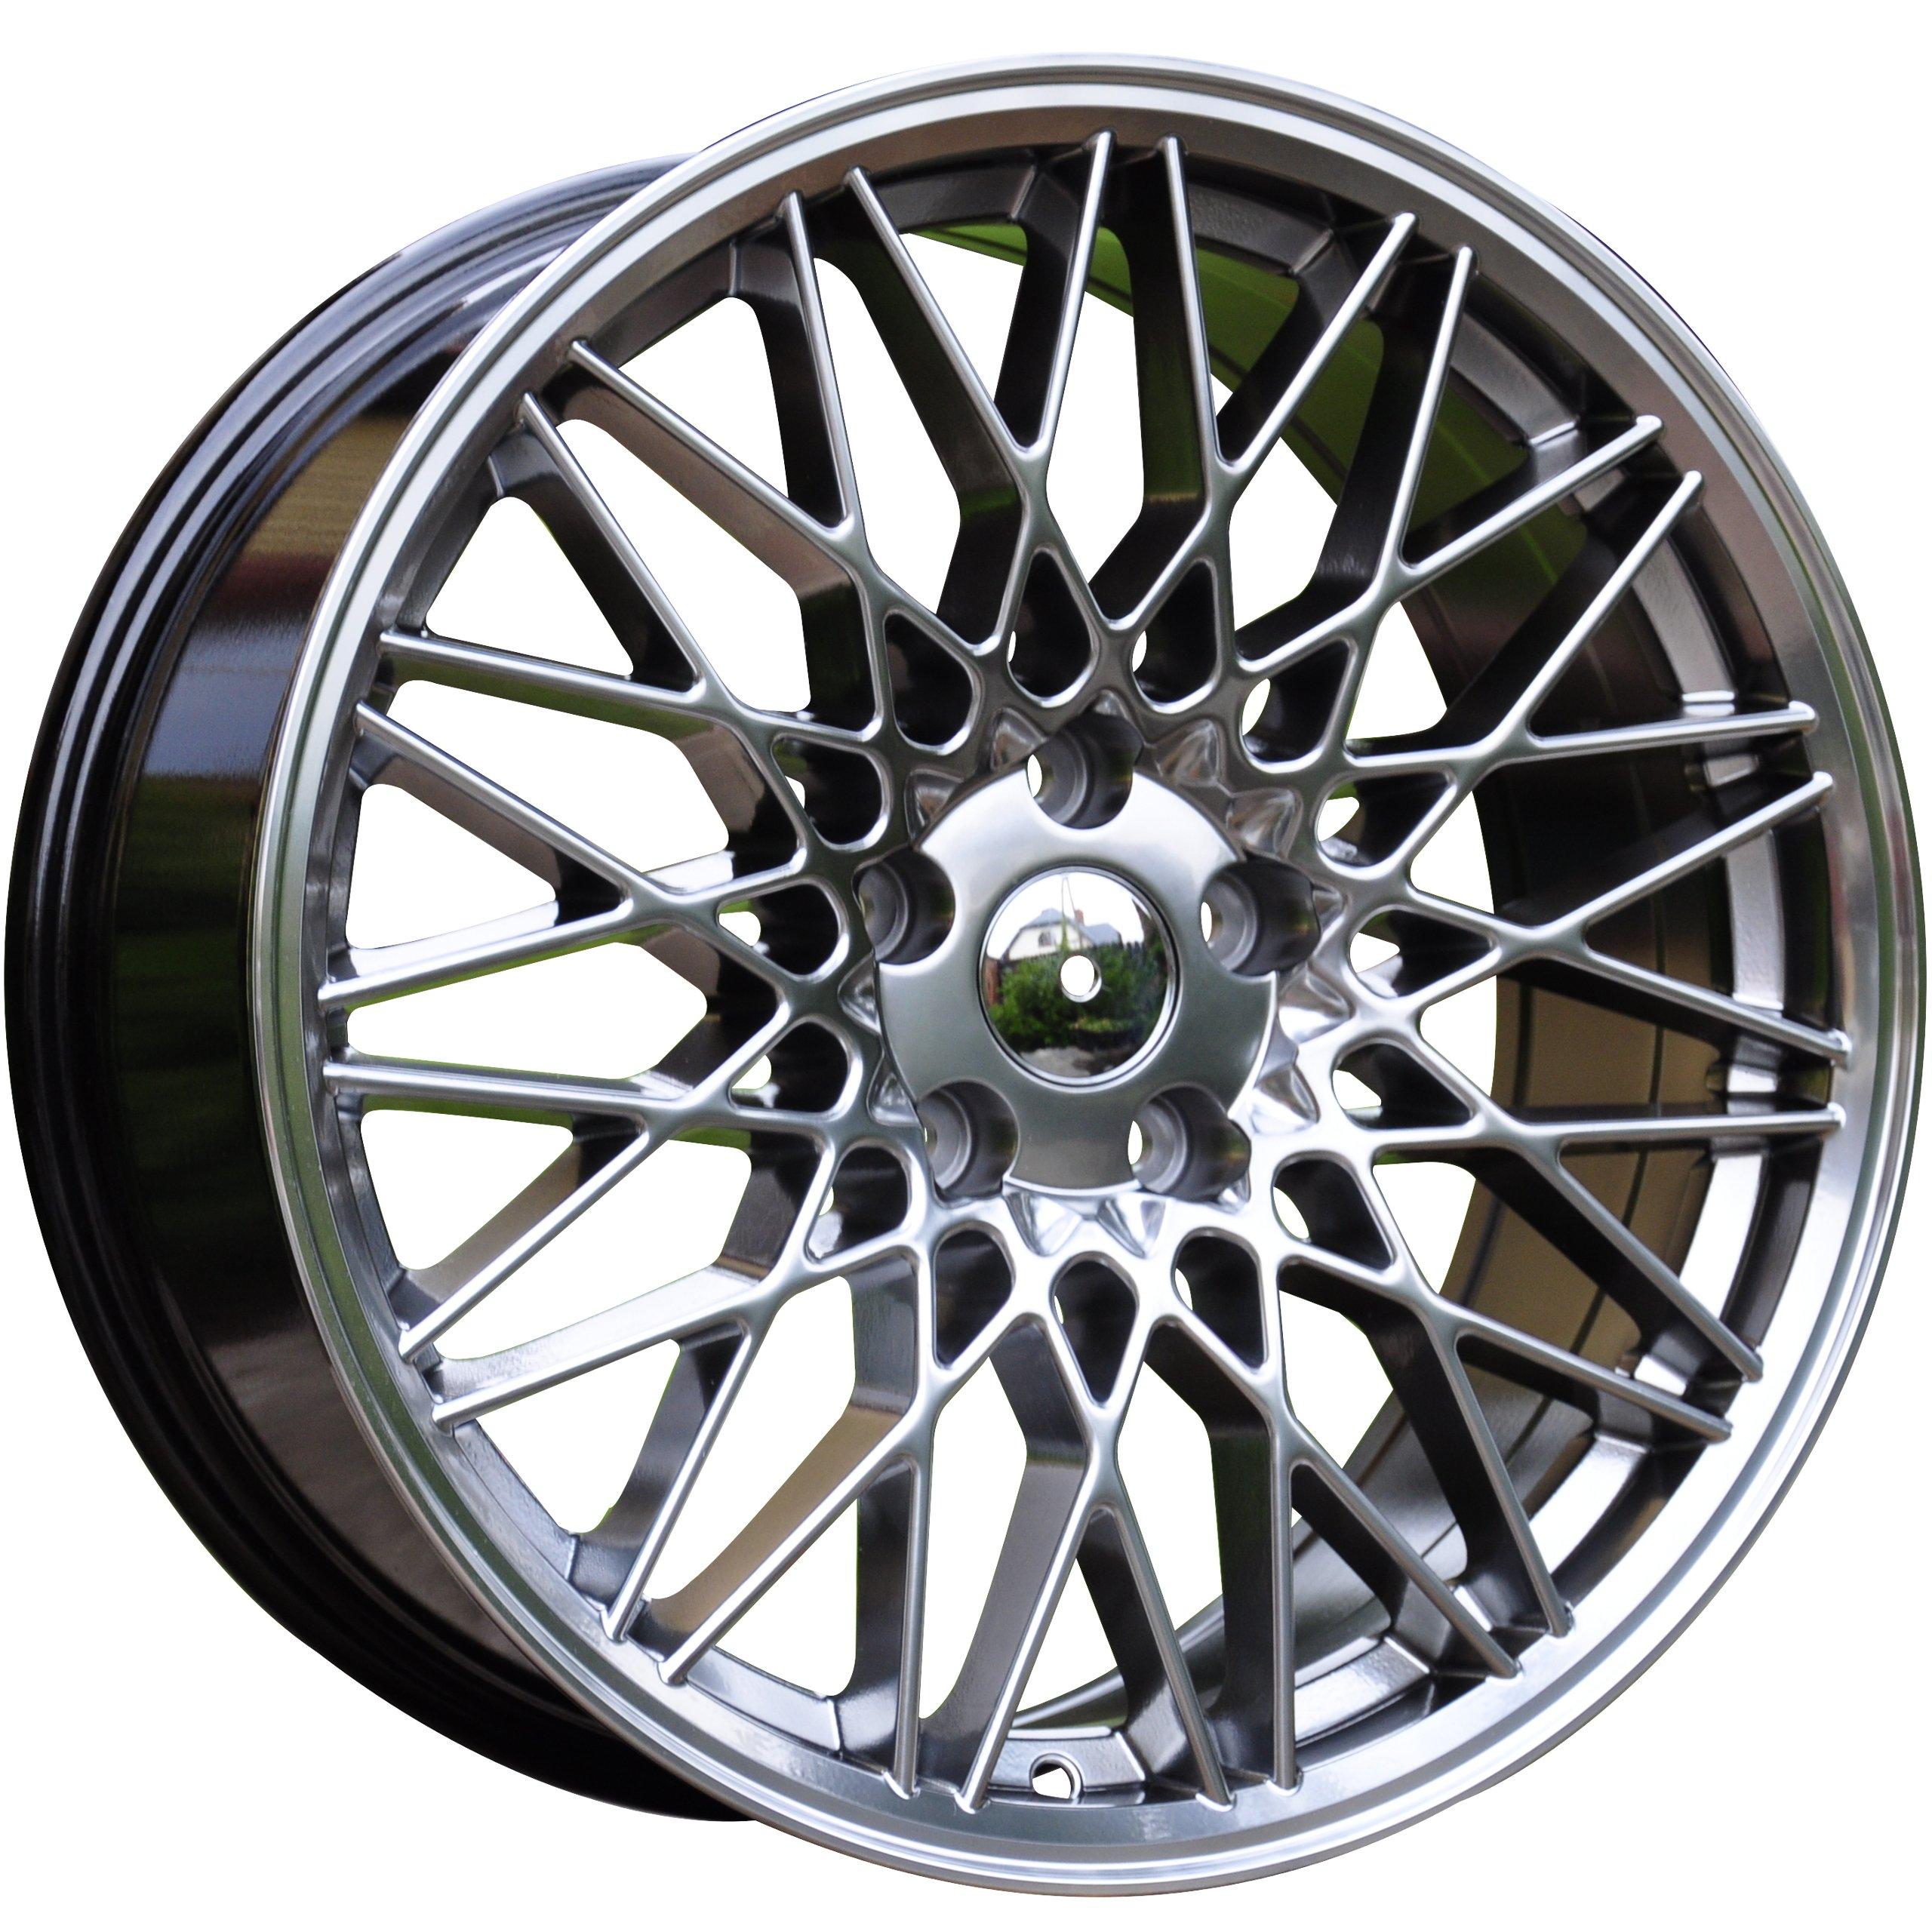 Felgi 18 5x112 Audi A4 A5 A6 Skoda Kodiaq Superb 7018619240